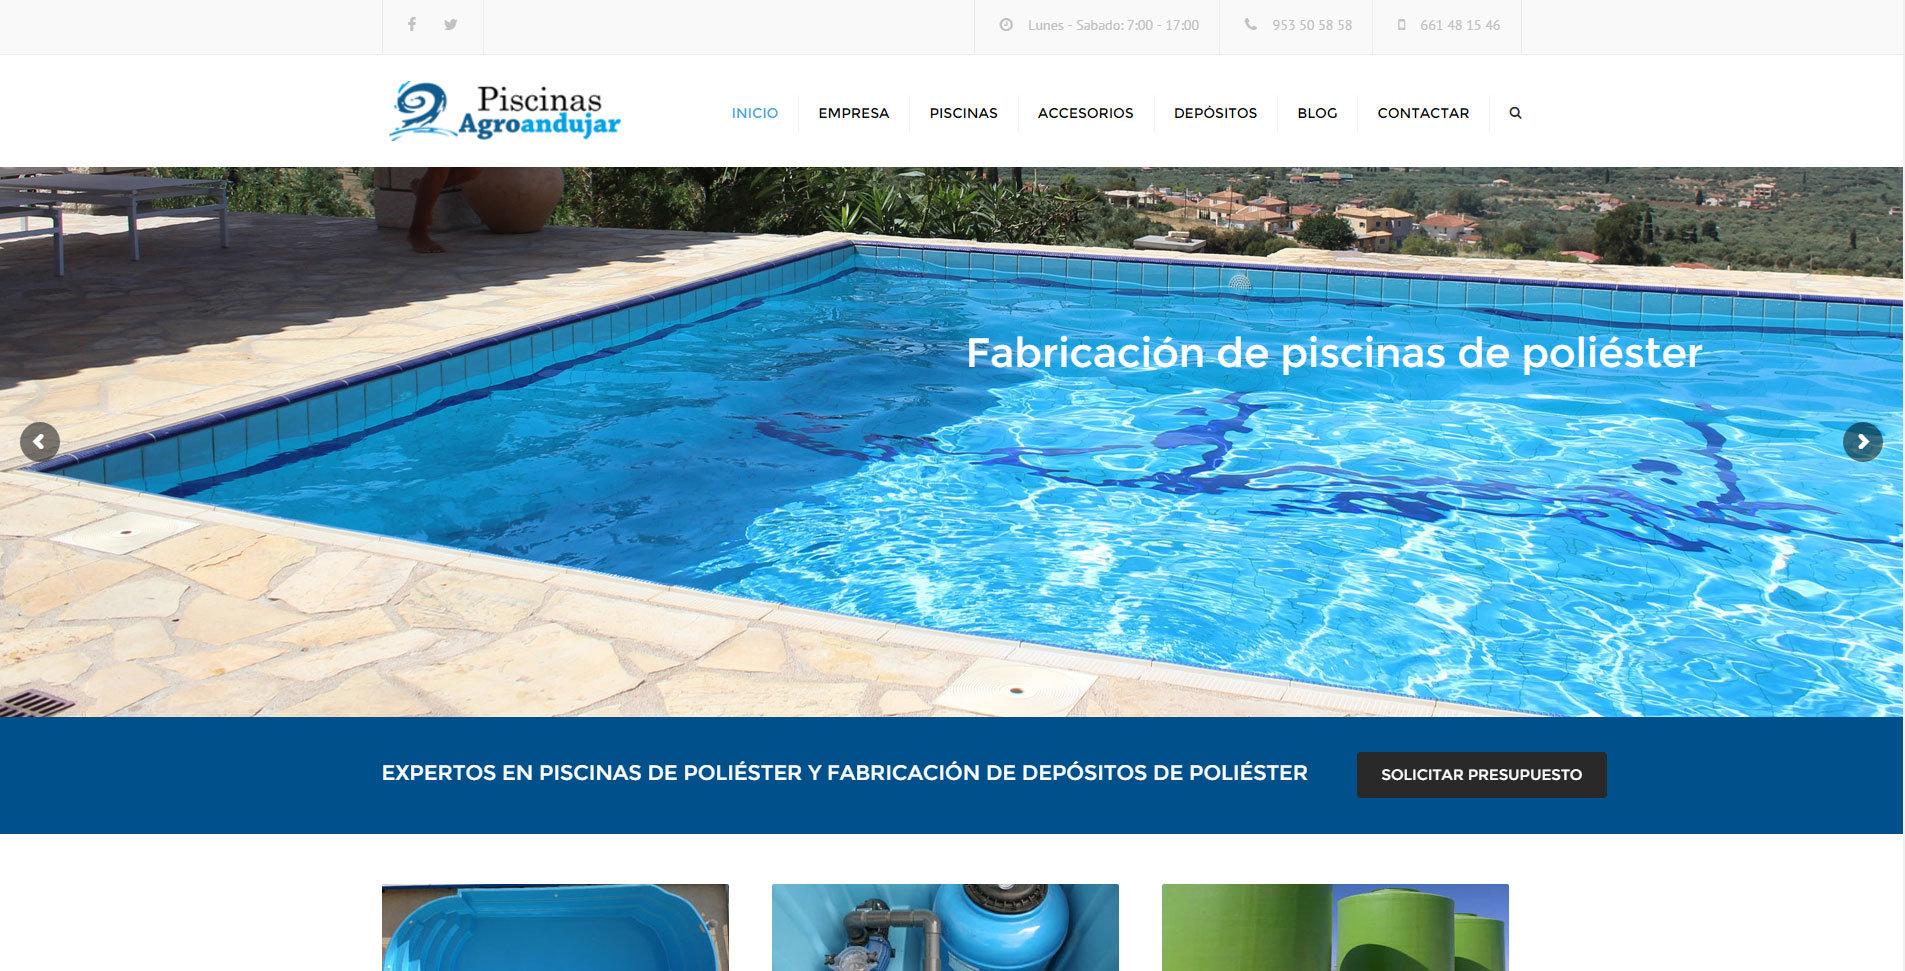 diseño web para fabrica de piscinas de poliester